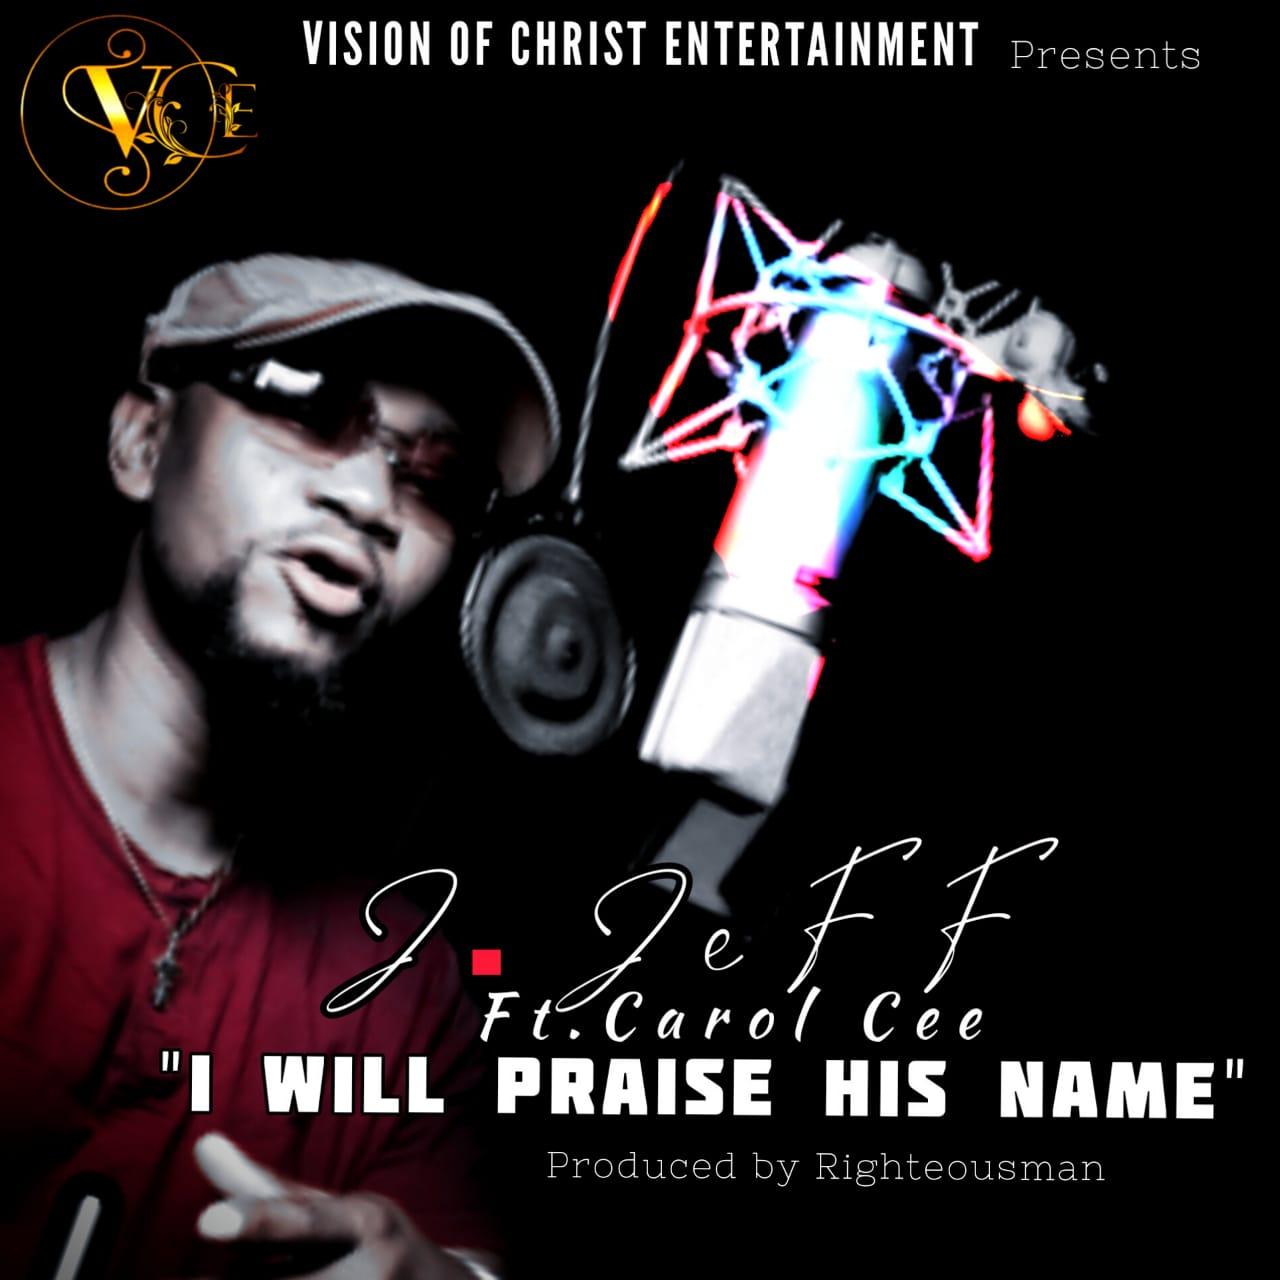 I WILL PRAISE HIS NAME - J. Jeff ft Carol Cee